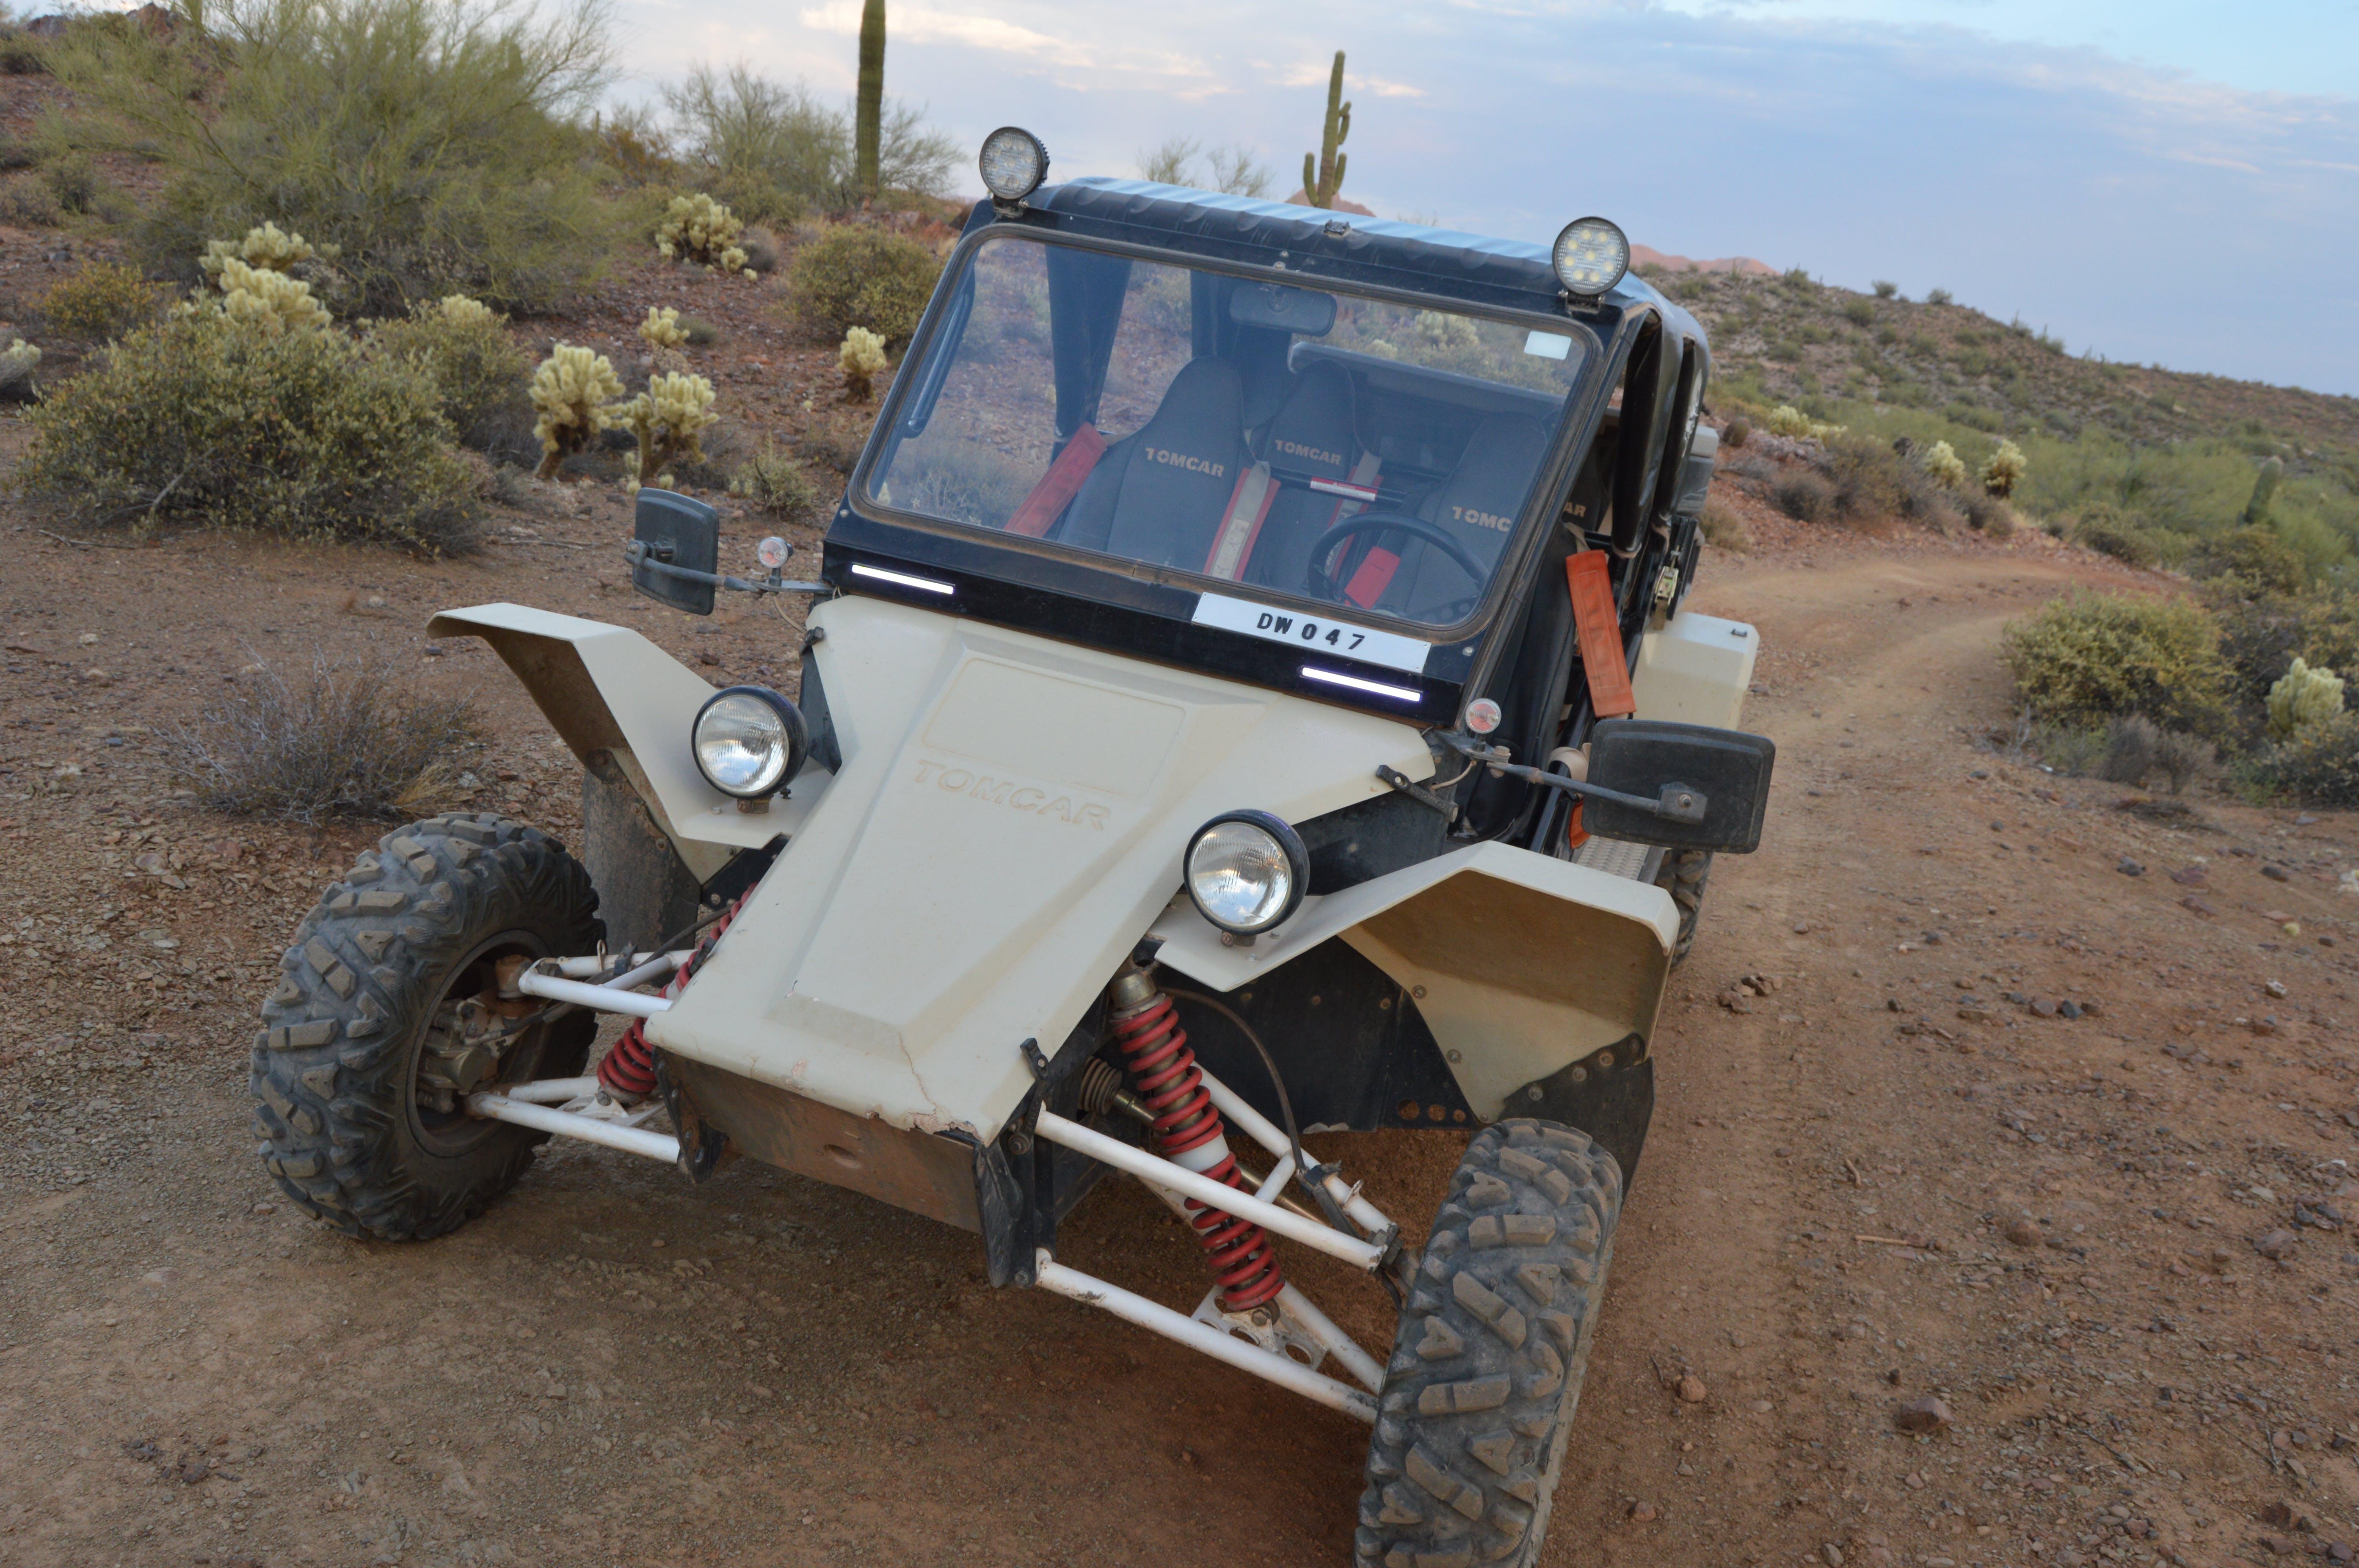 Tomcar ATV in Arizona terrain